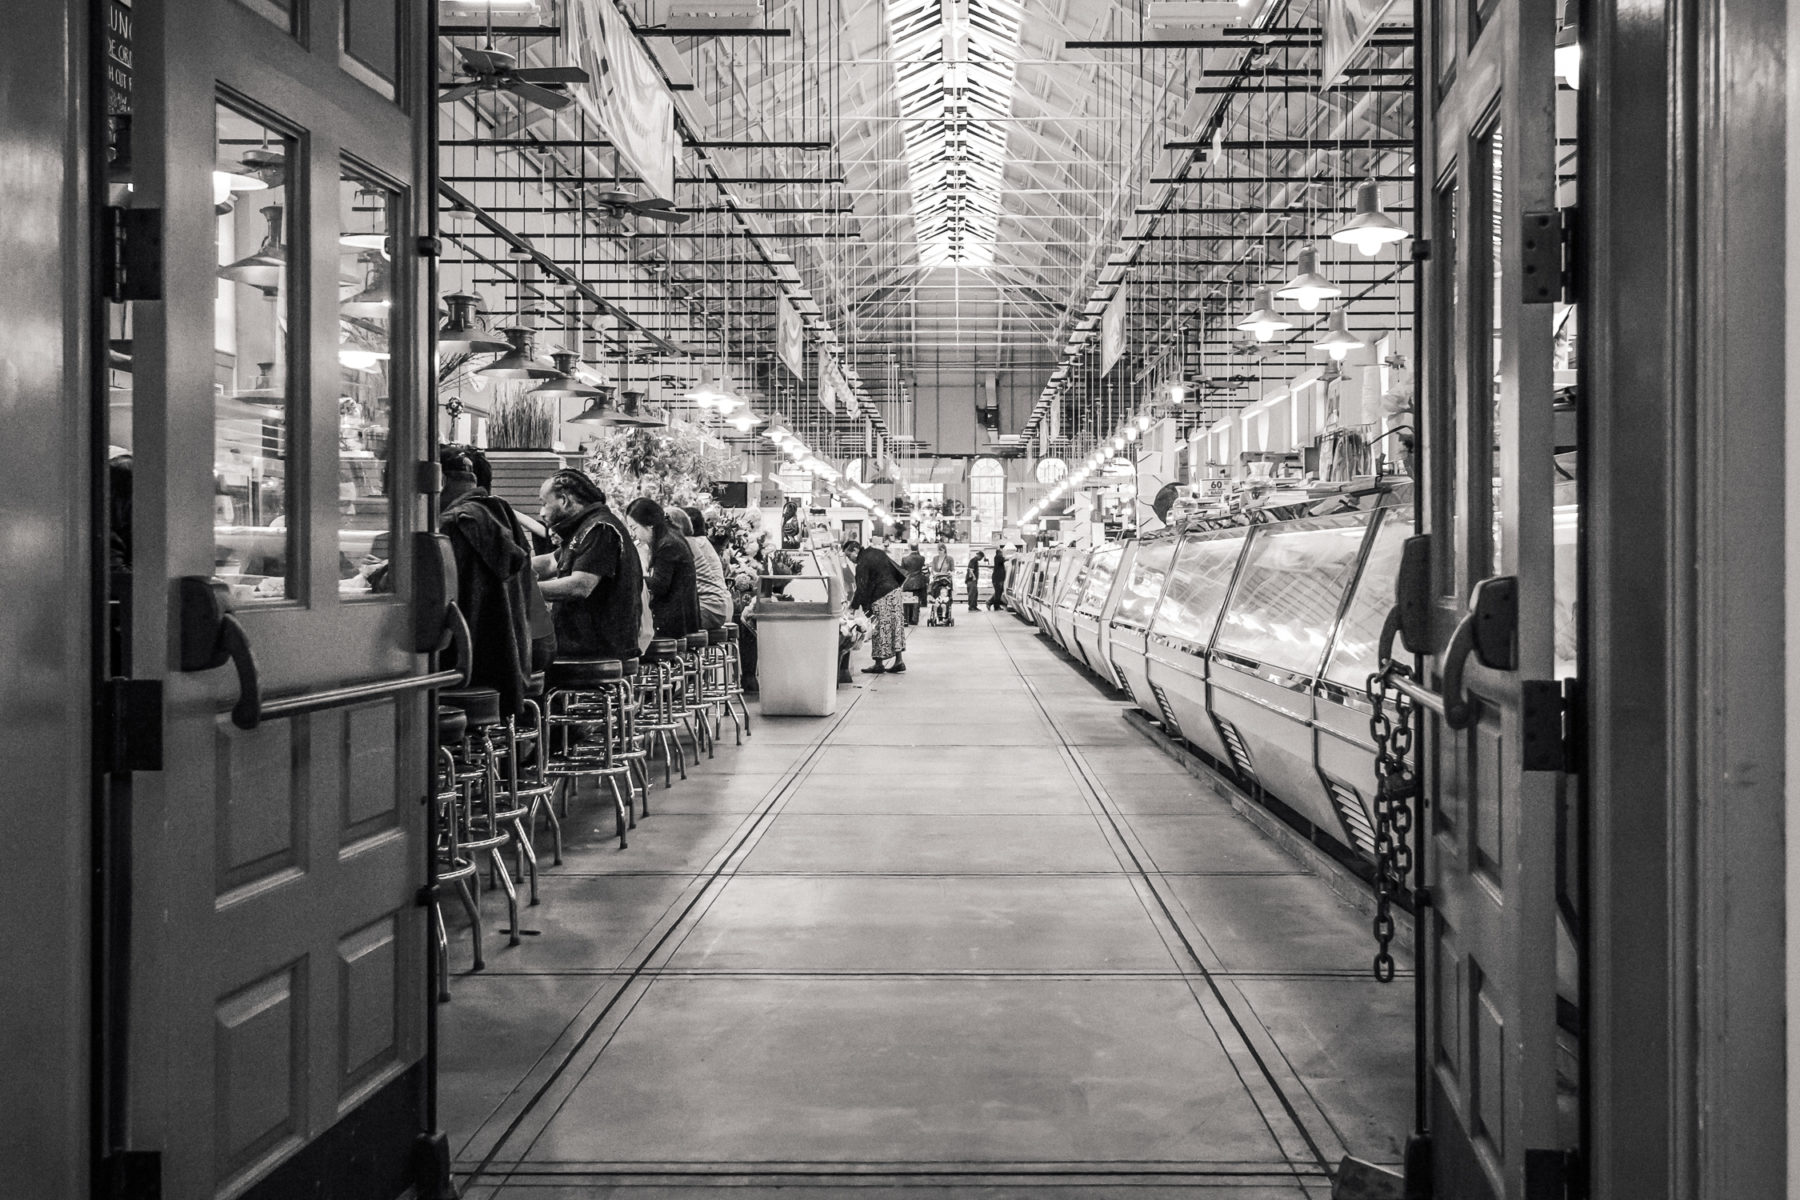 Eastern Market Washington D.C.